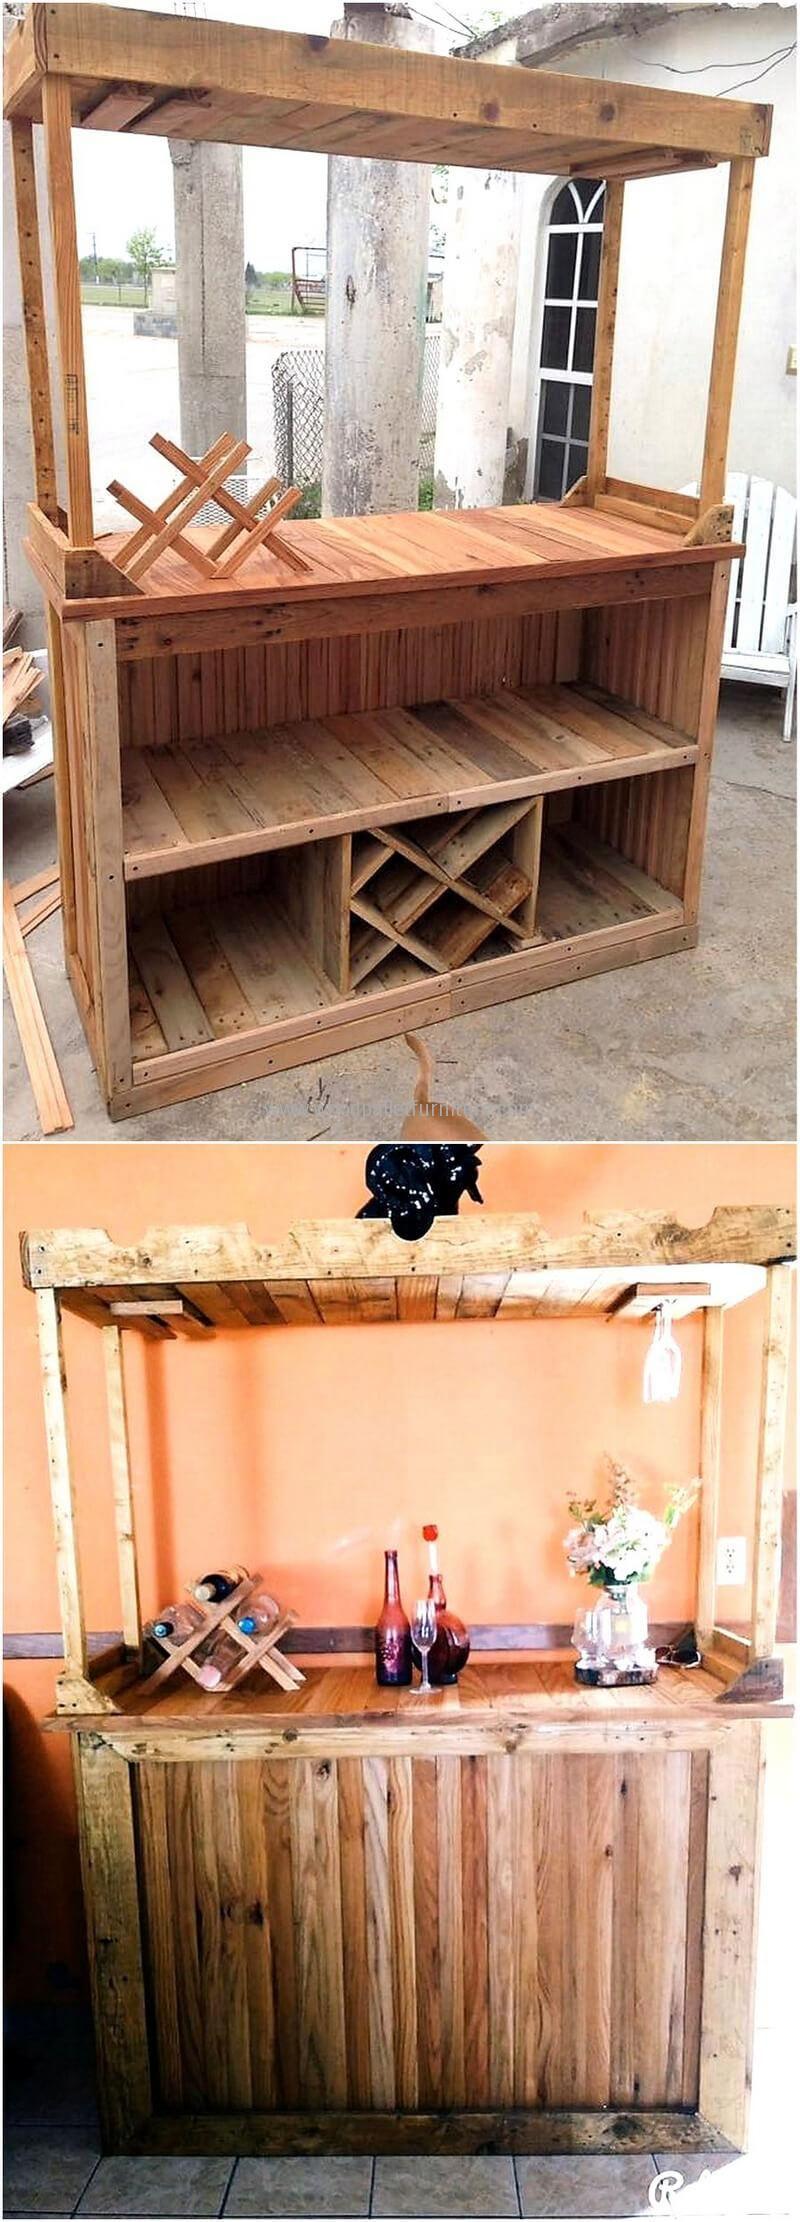 Palettenbar, Palettenholz, Diy Palettenprojekte, Holzprojekte, Gartenbar,  Palettendeck Möbel, Kreative Dinge, Kreativ, Holz